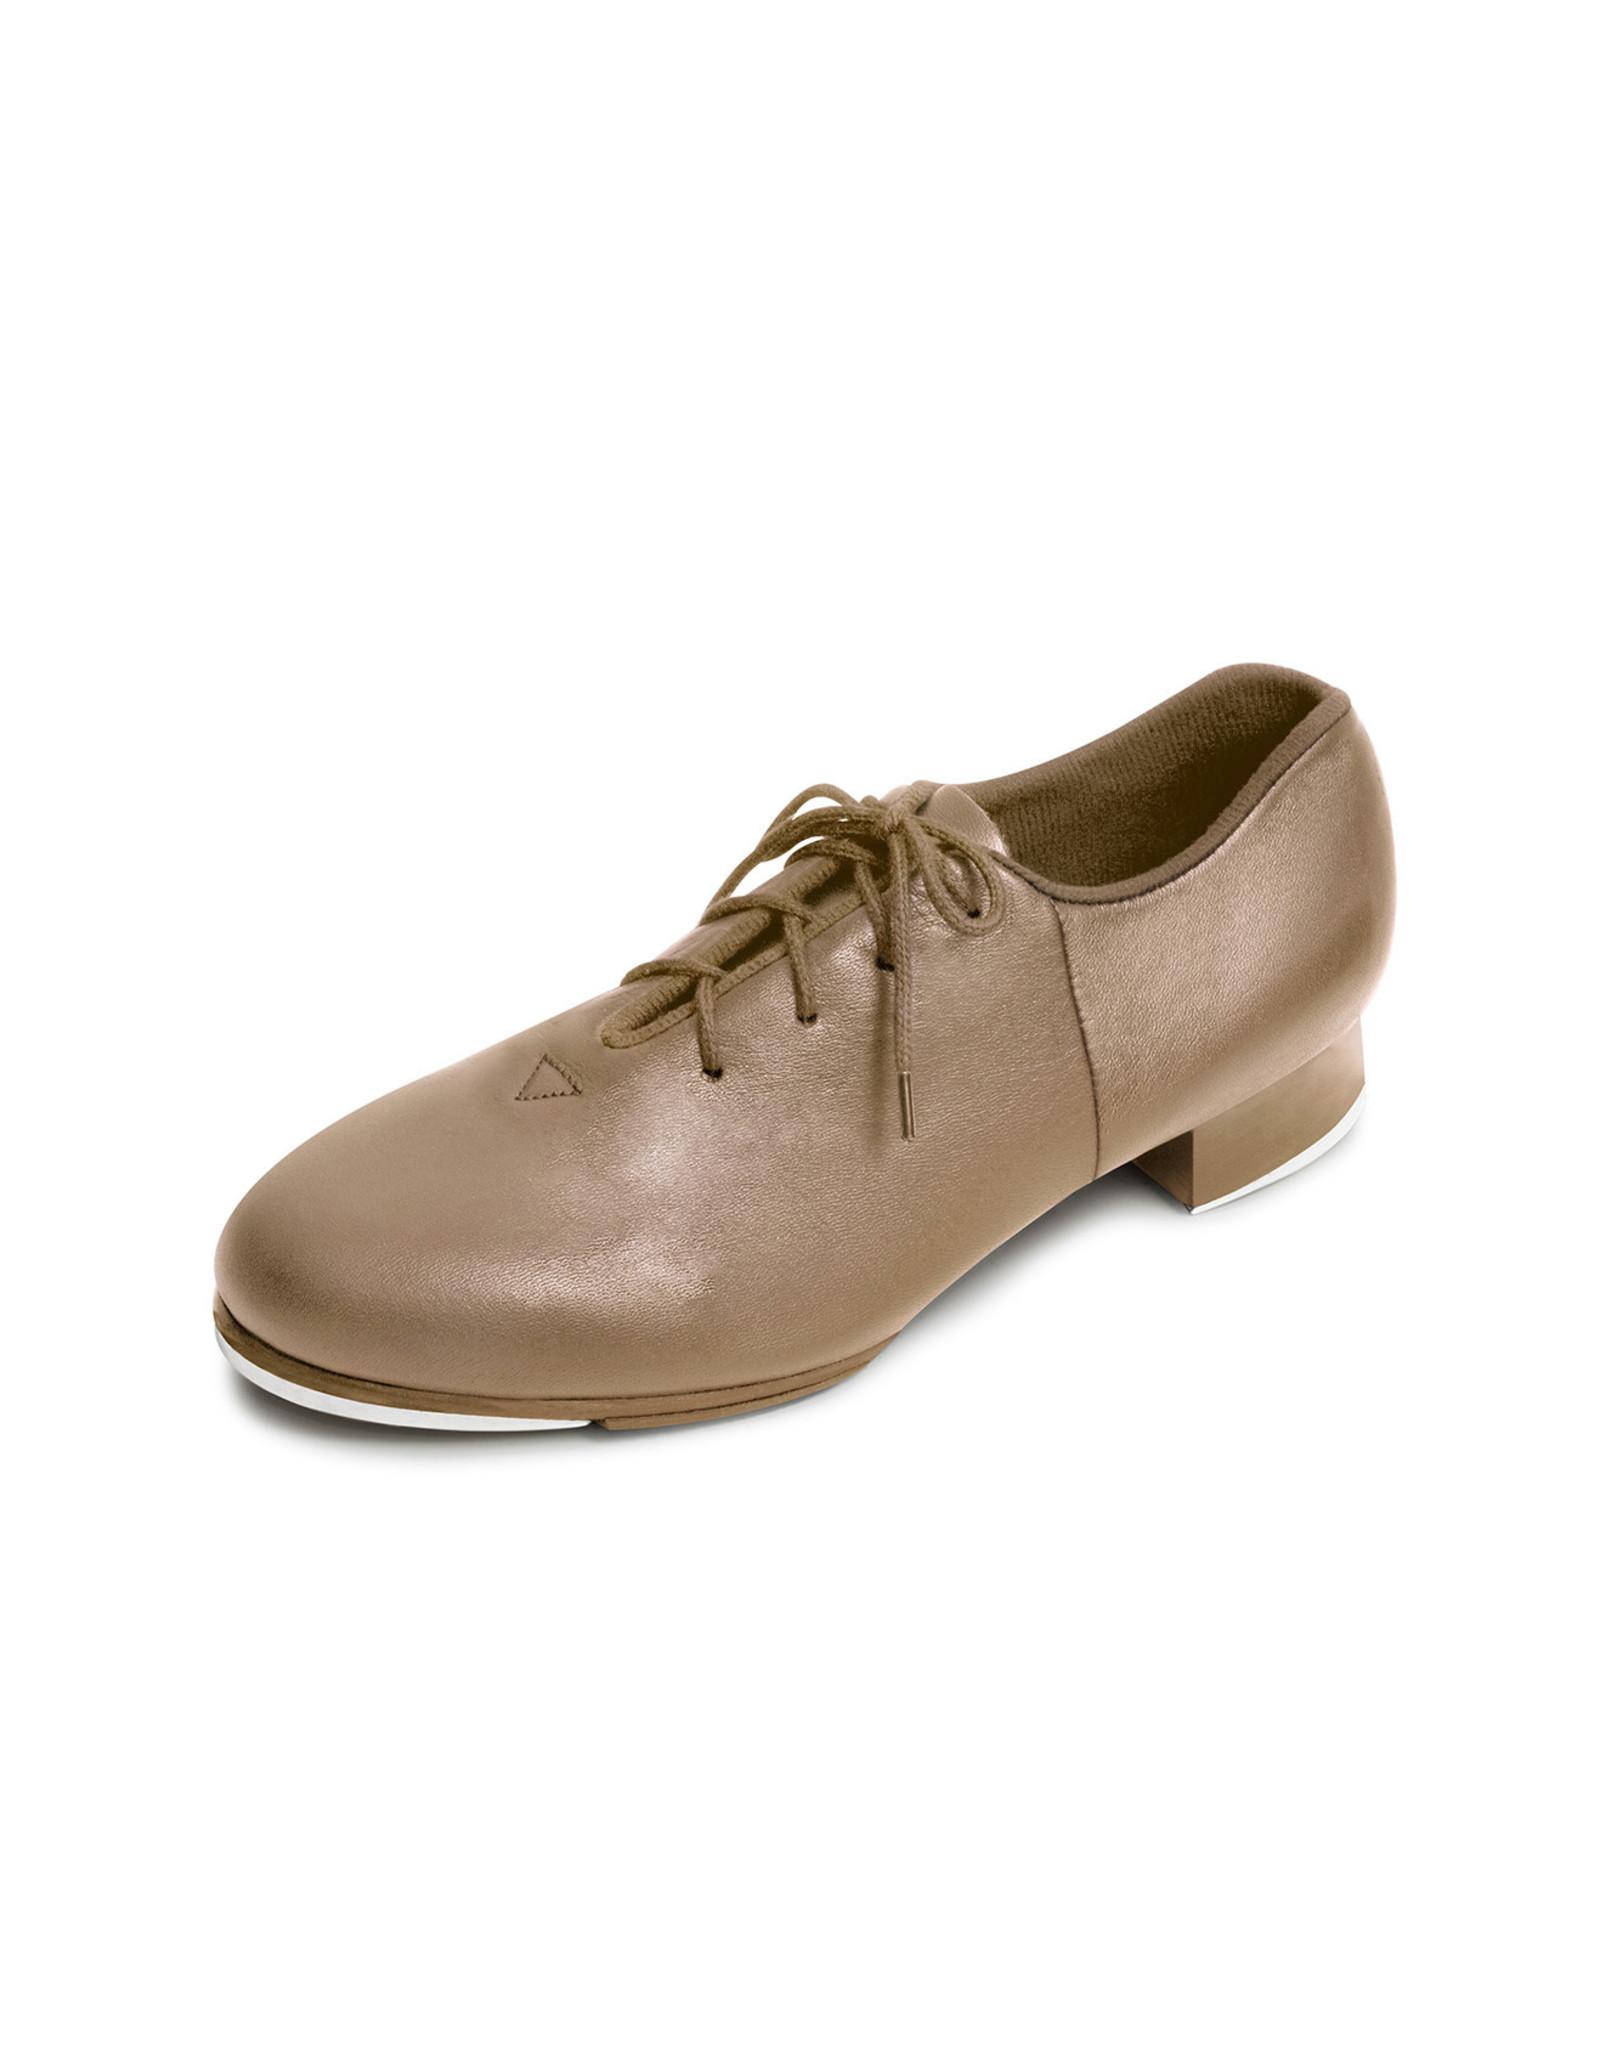 Bloch S0388G Tapflex Tap Shoe  TAN